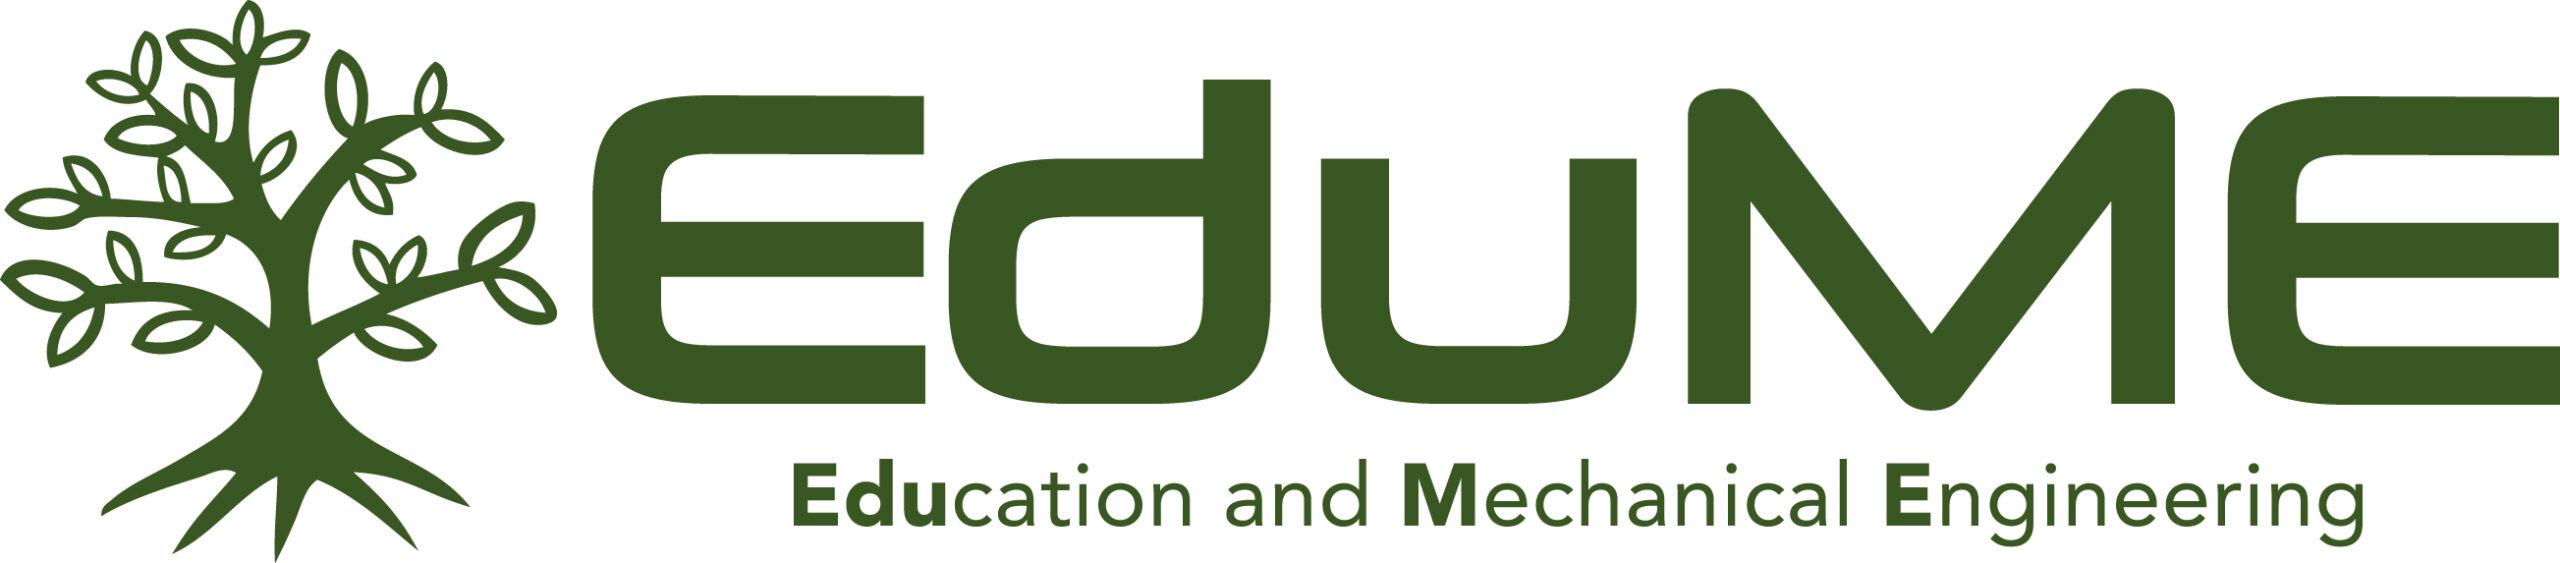 EduME-Education & Mechnical Engineering / Frisk NaturligtVis